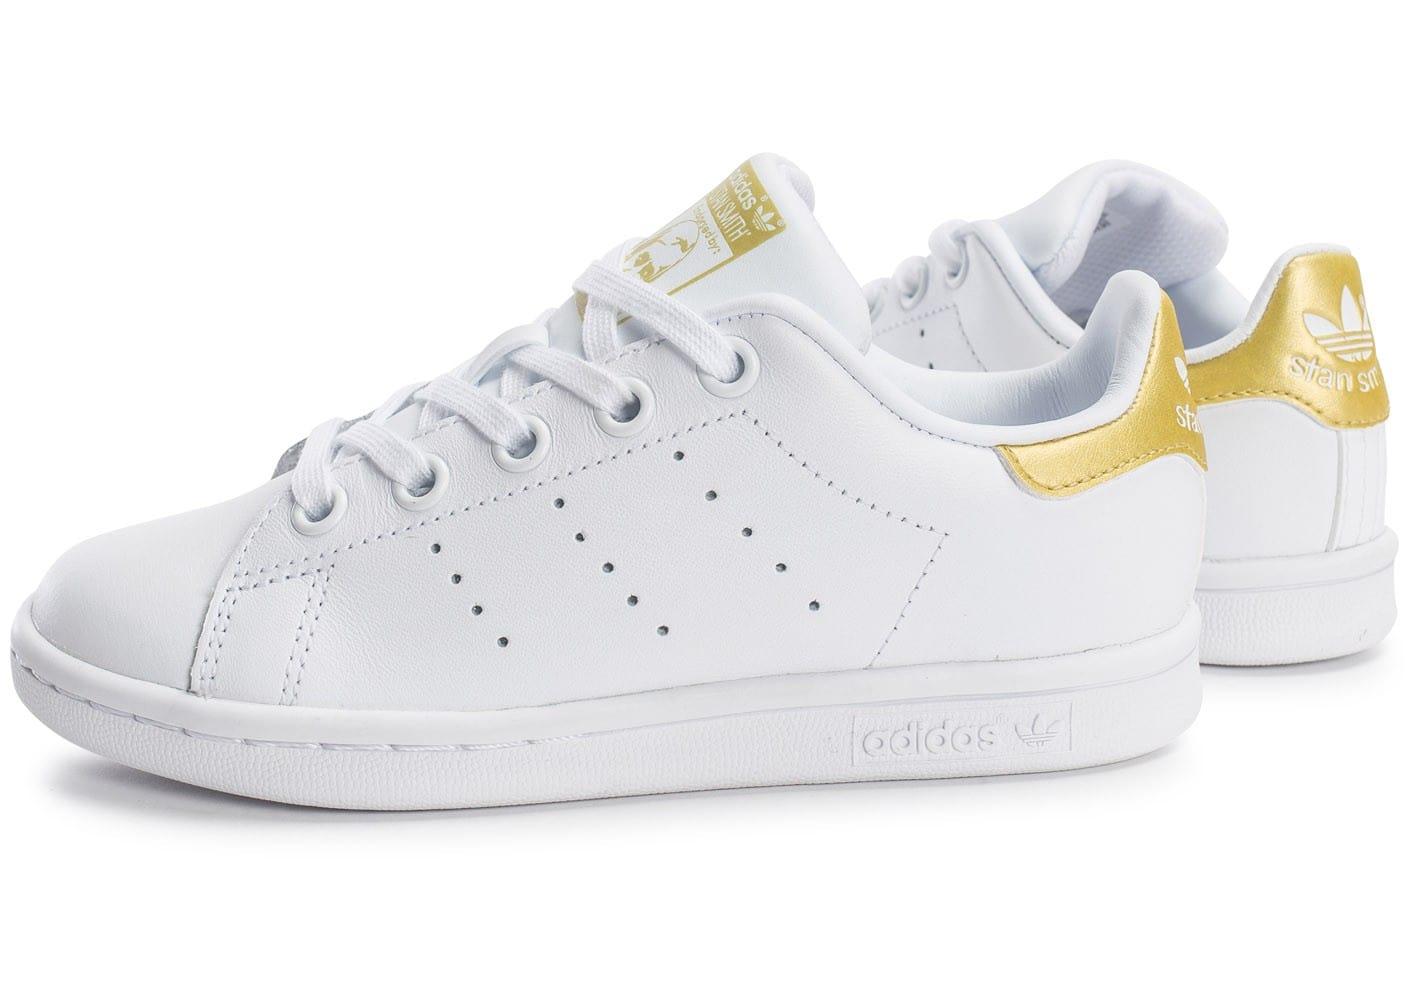 adidas stan smith taille 34